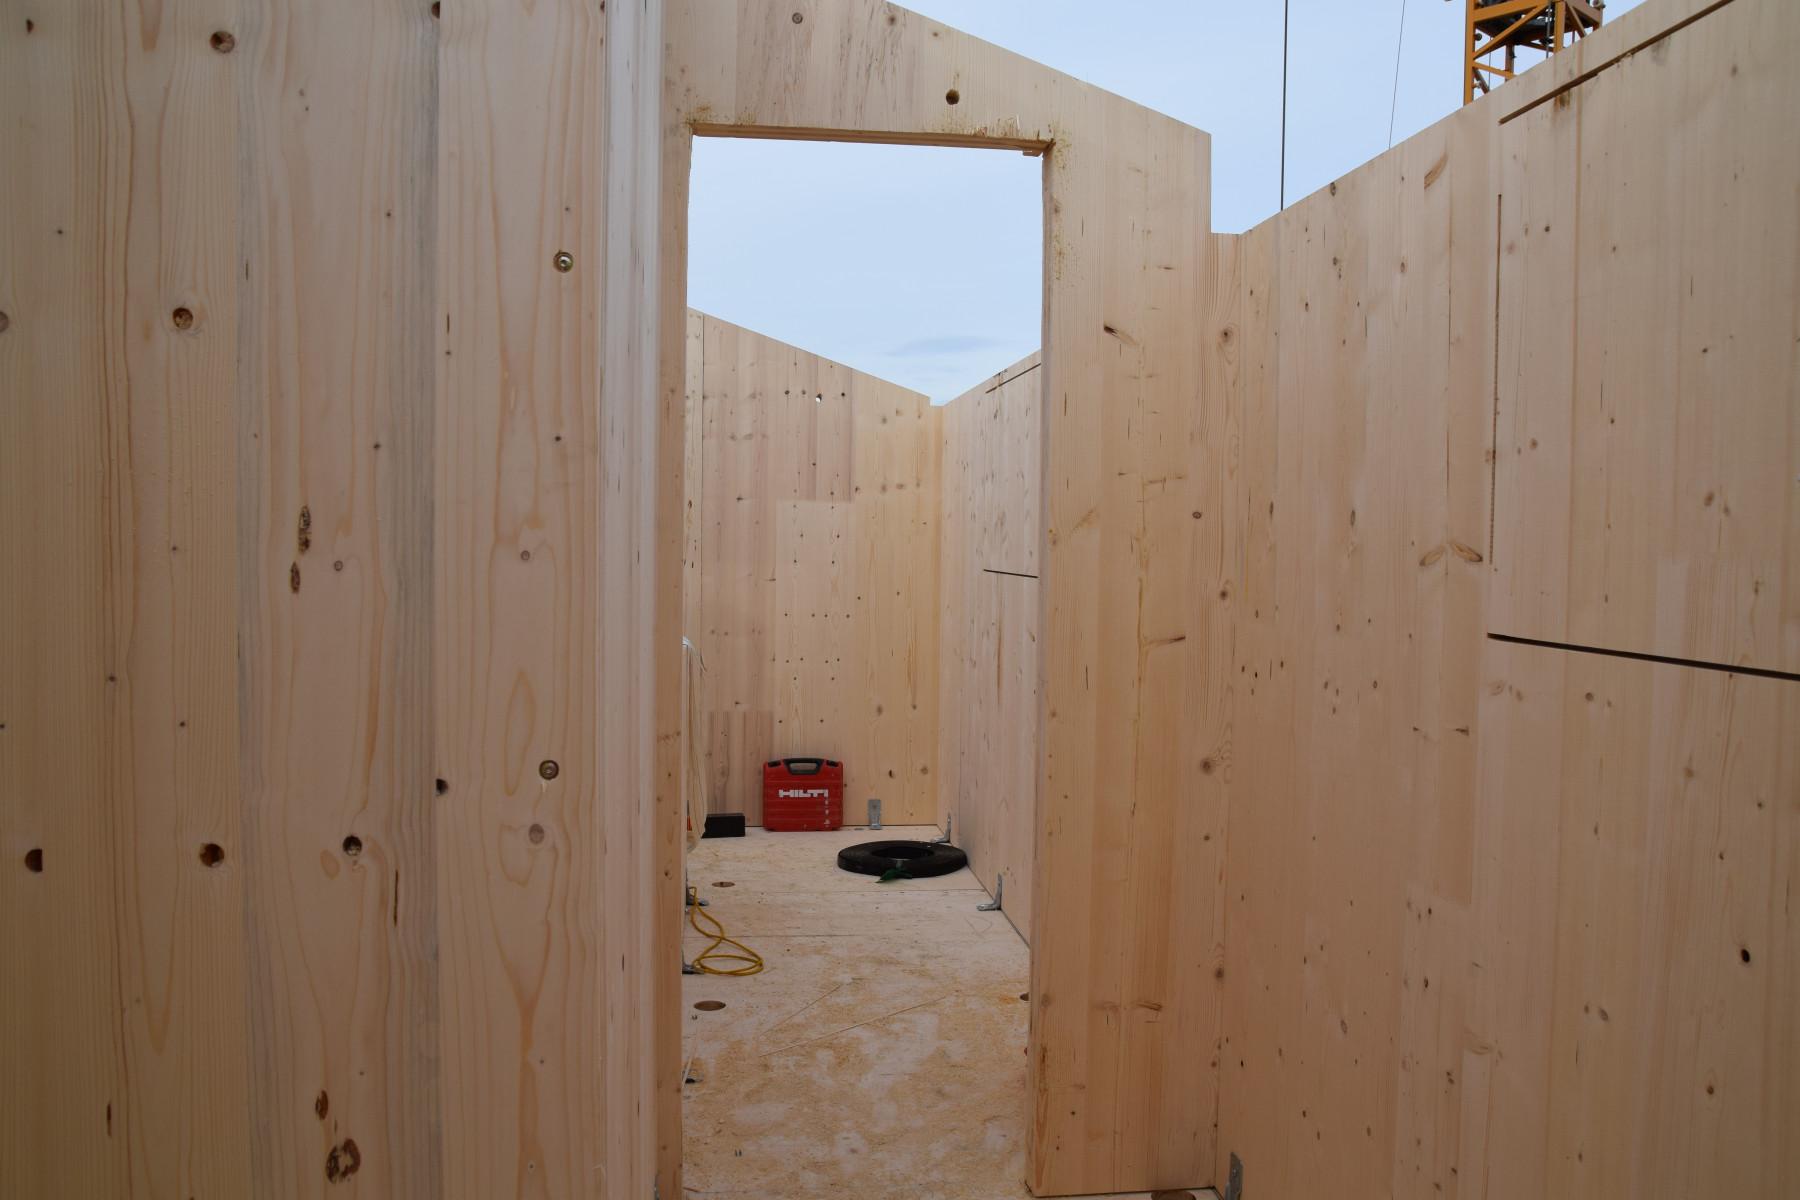 DSC_0715Strasser Holzbau Riedering.jpg